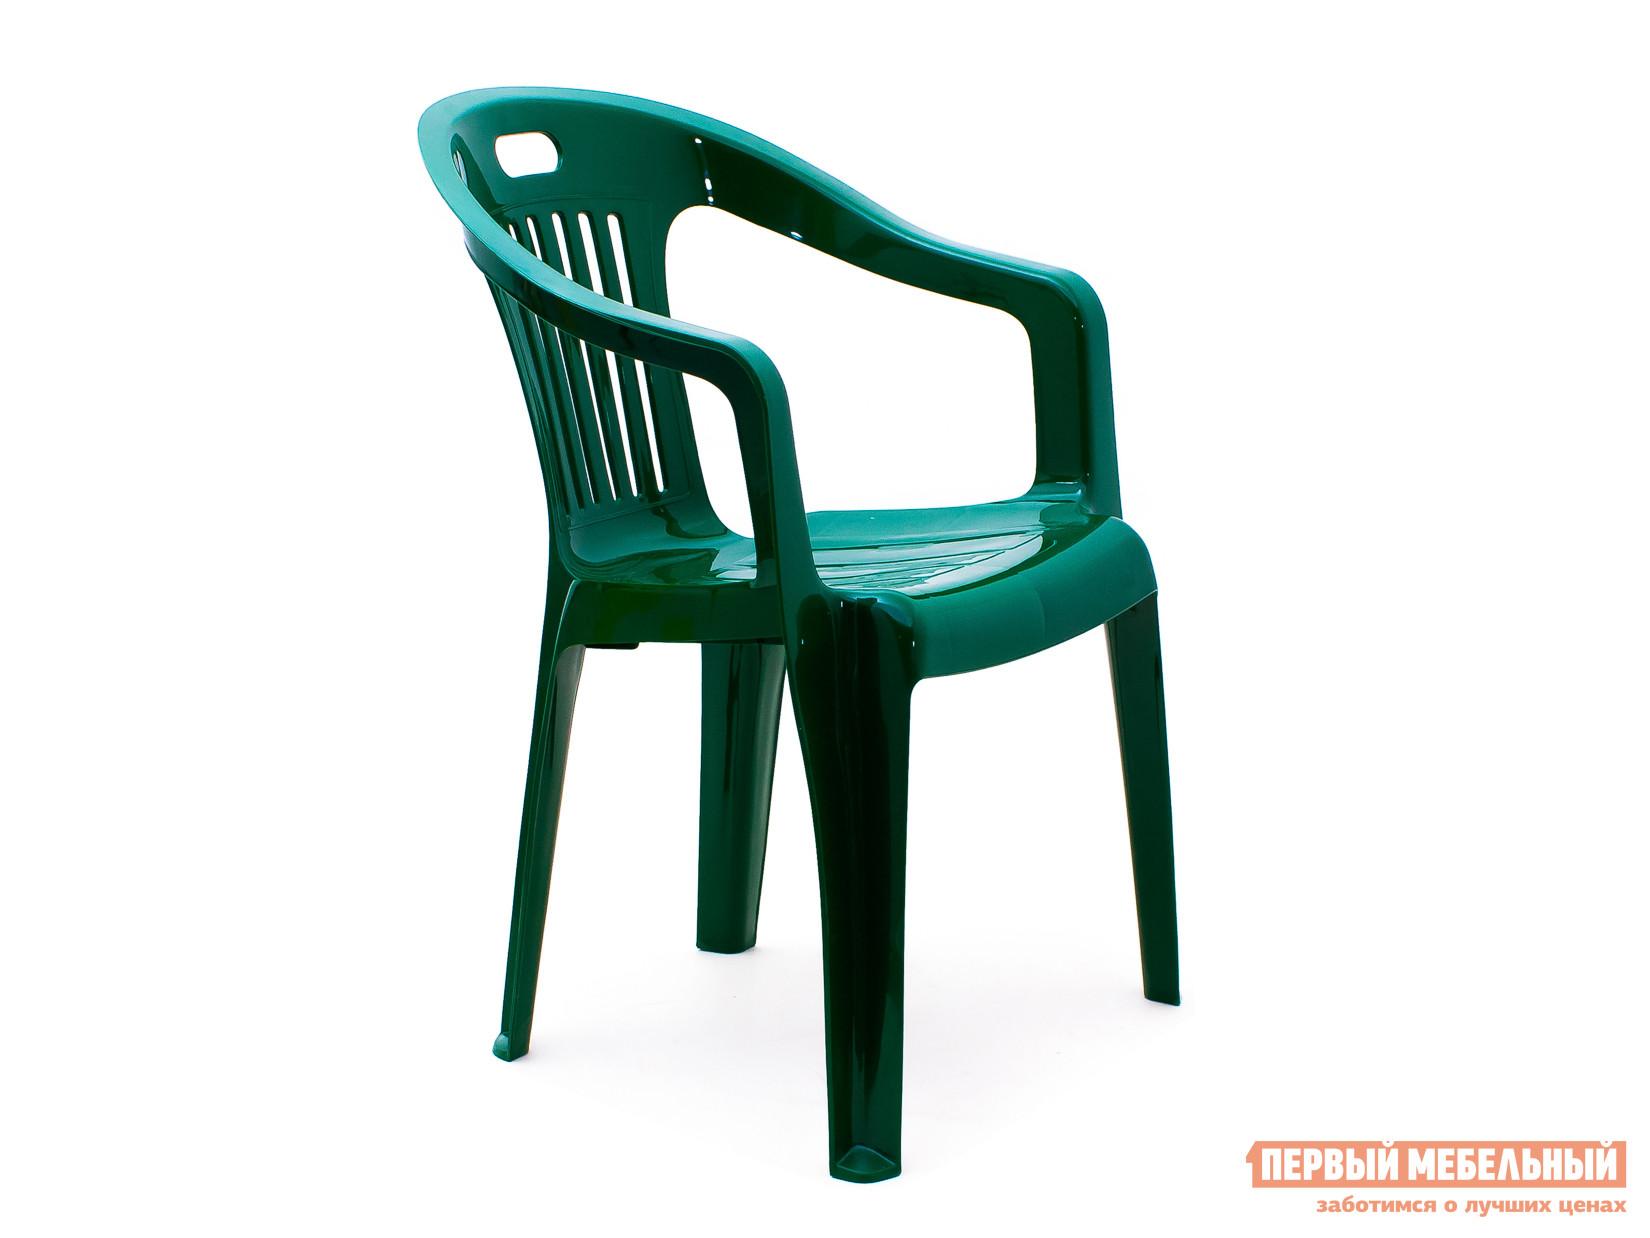 "Пластиковый стул Стандарт Пластик Кресло №5 ""Комфорт-1"" (540x535x780мм) Темно-зеленый"